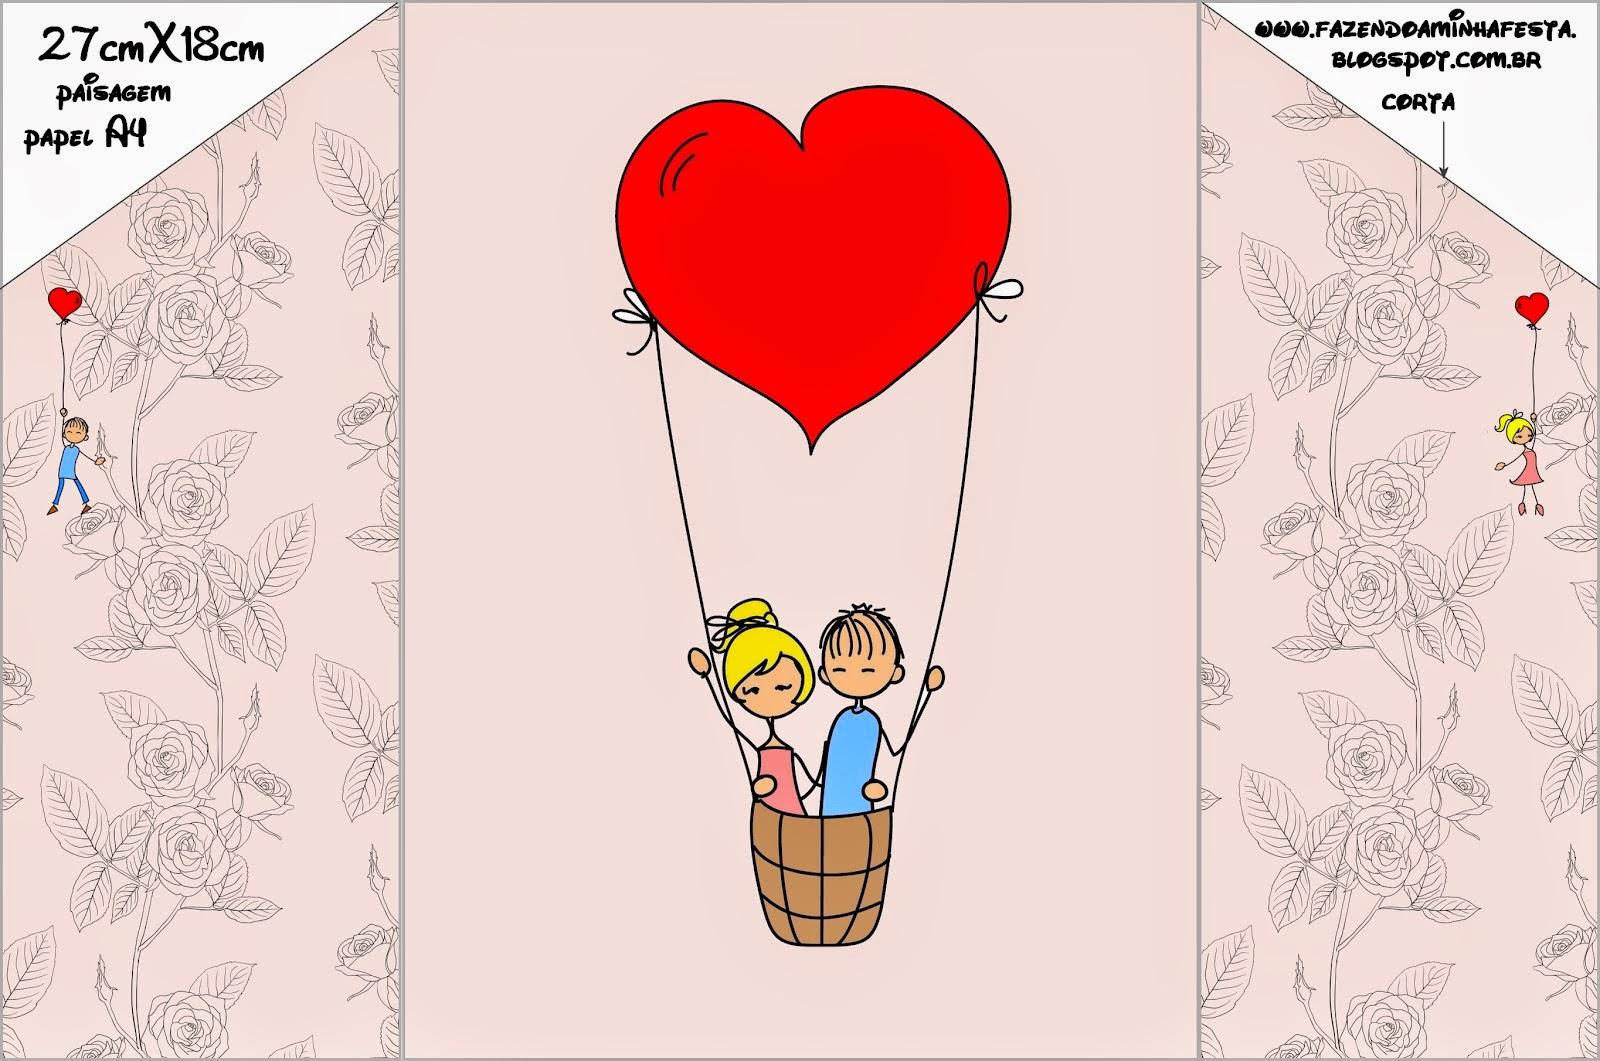 Wedding Couple With Balloons: Free Printable Wedding Invitations ...